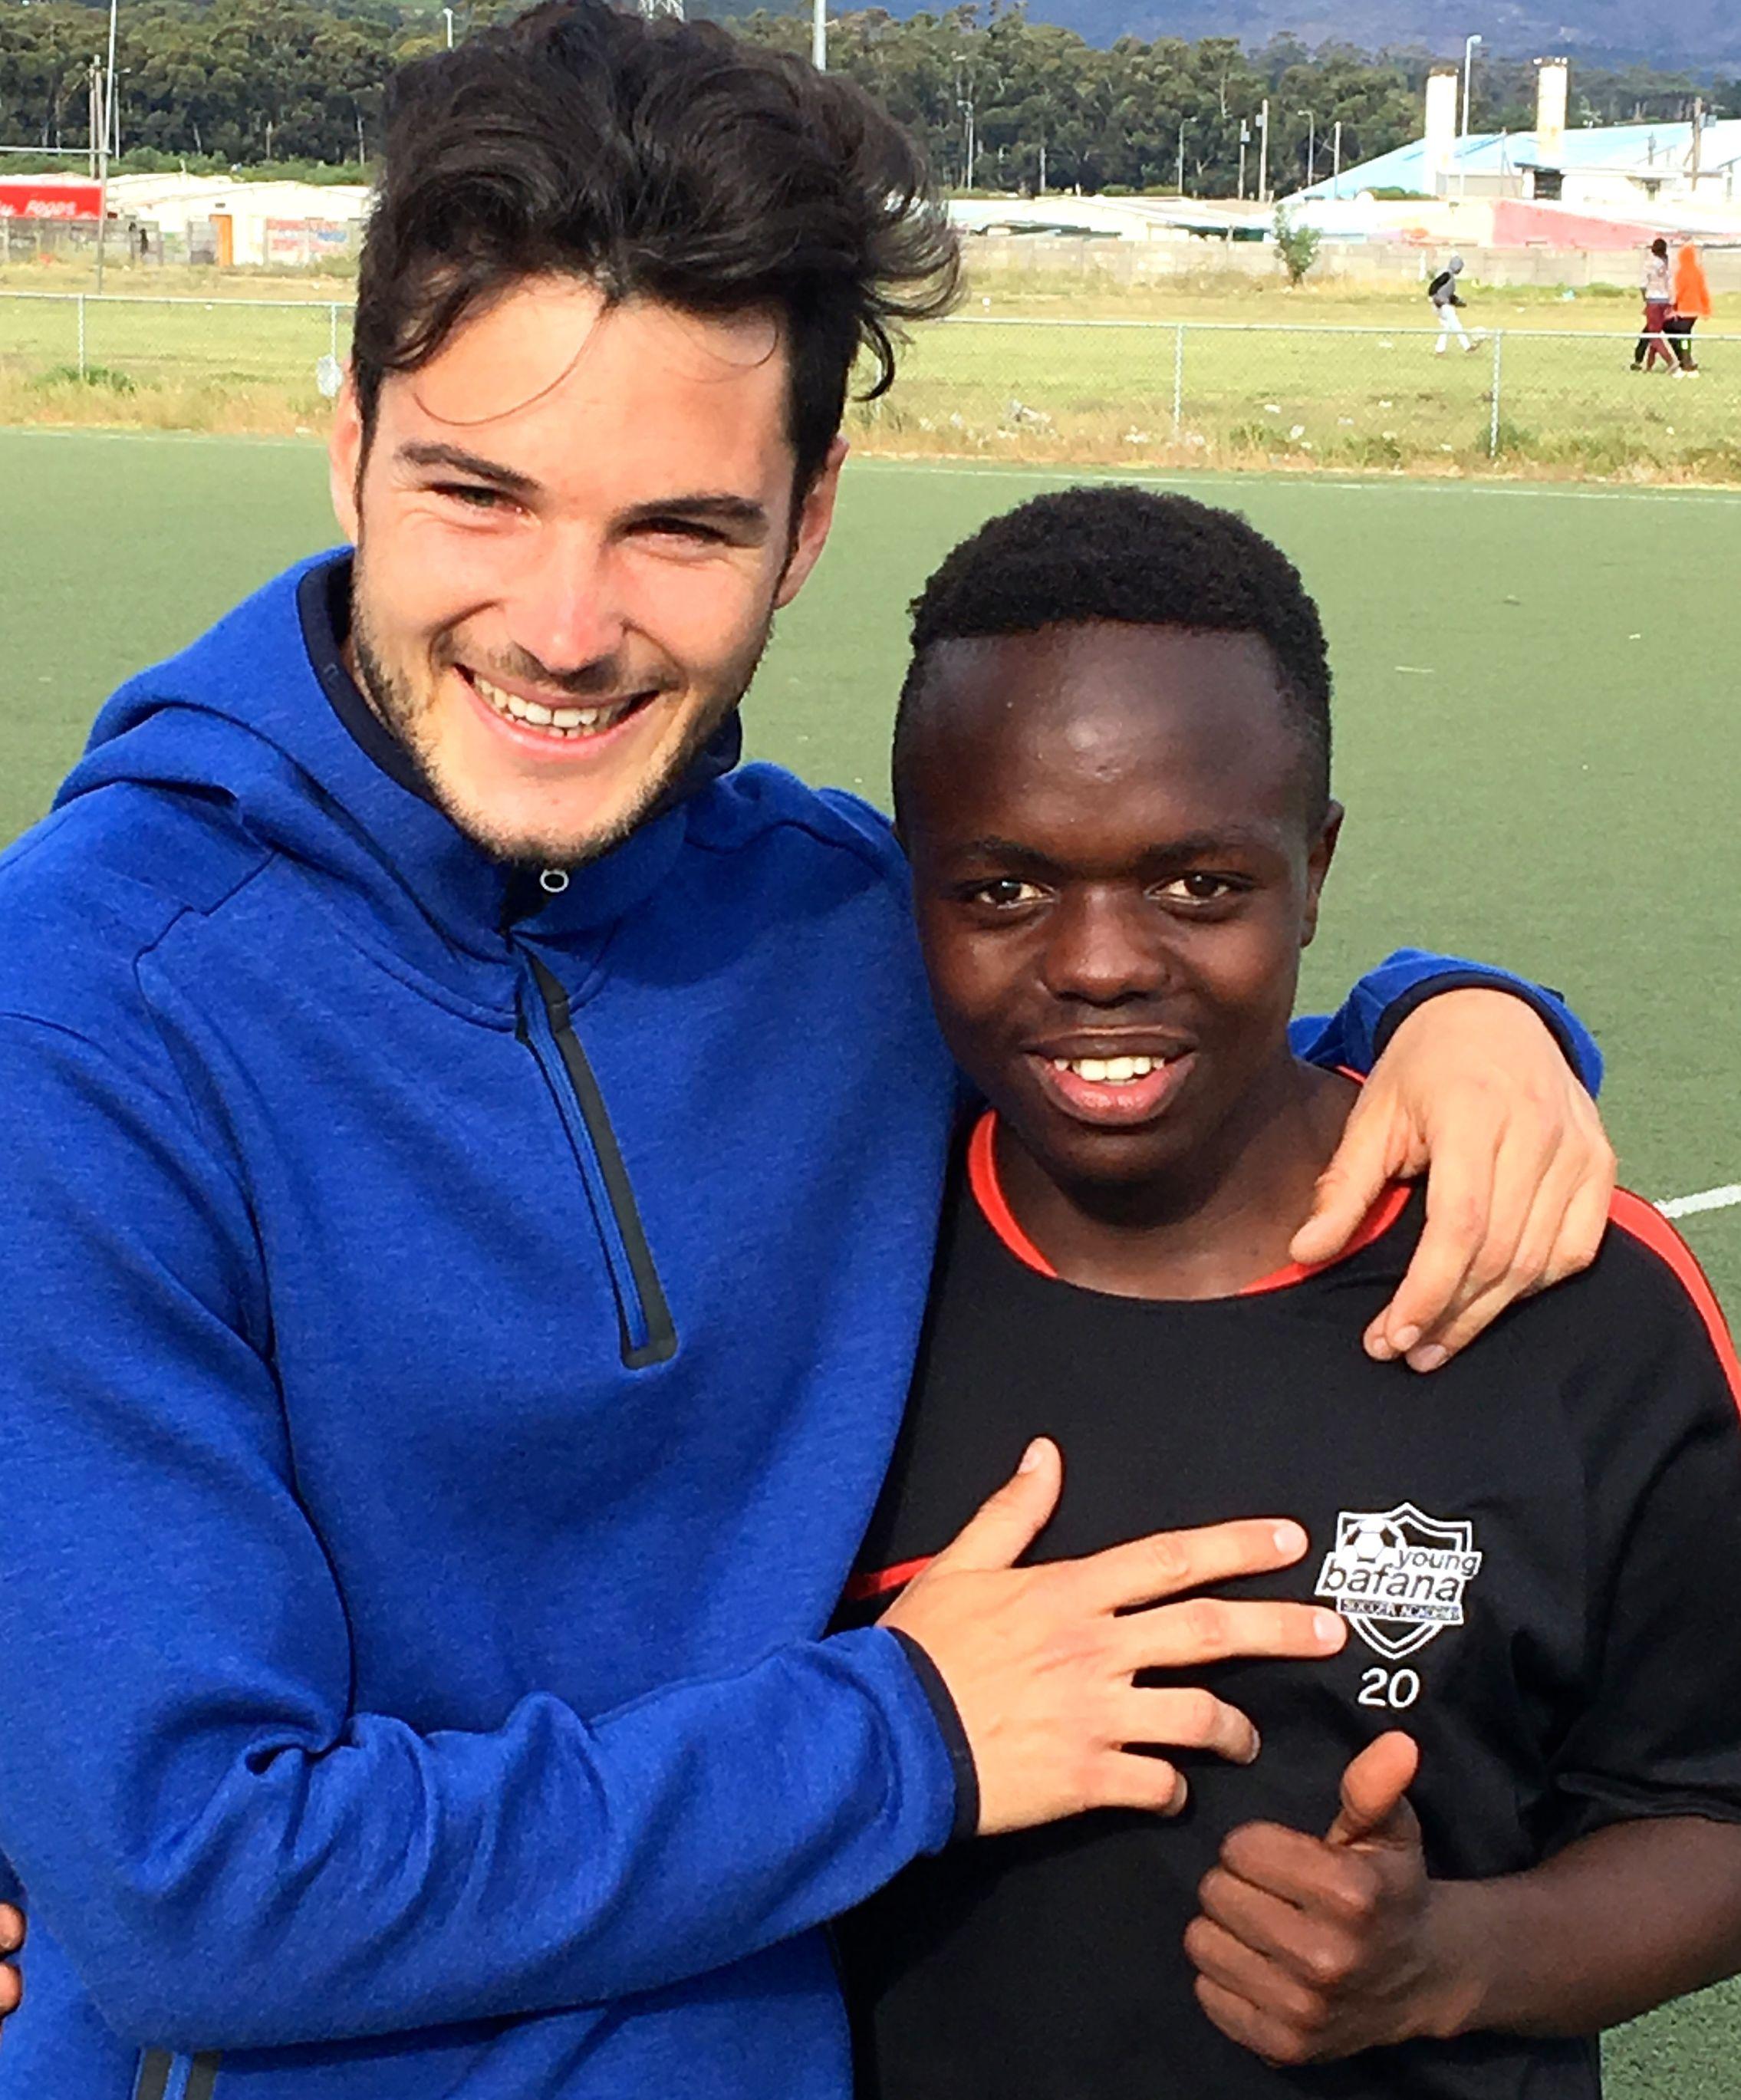 Young Bafana, Ronald Putsche